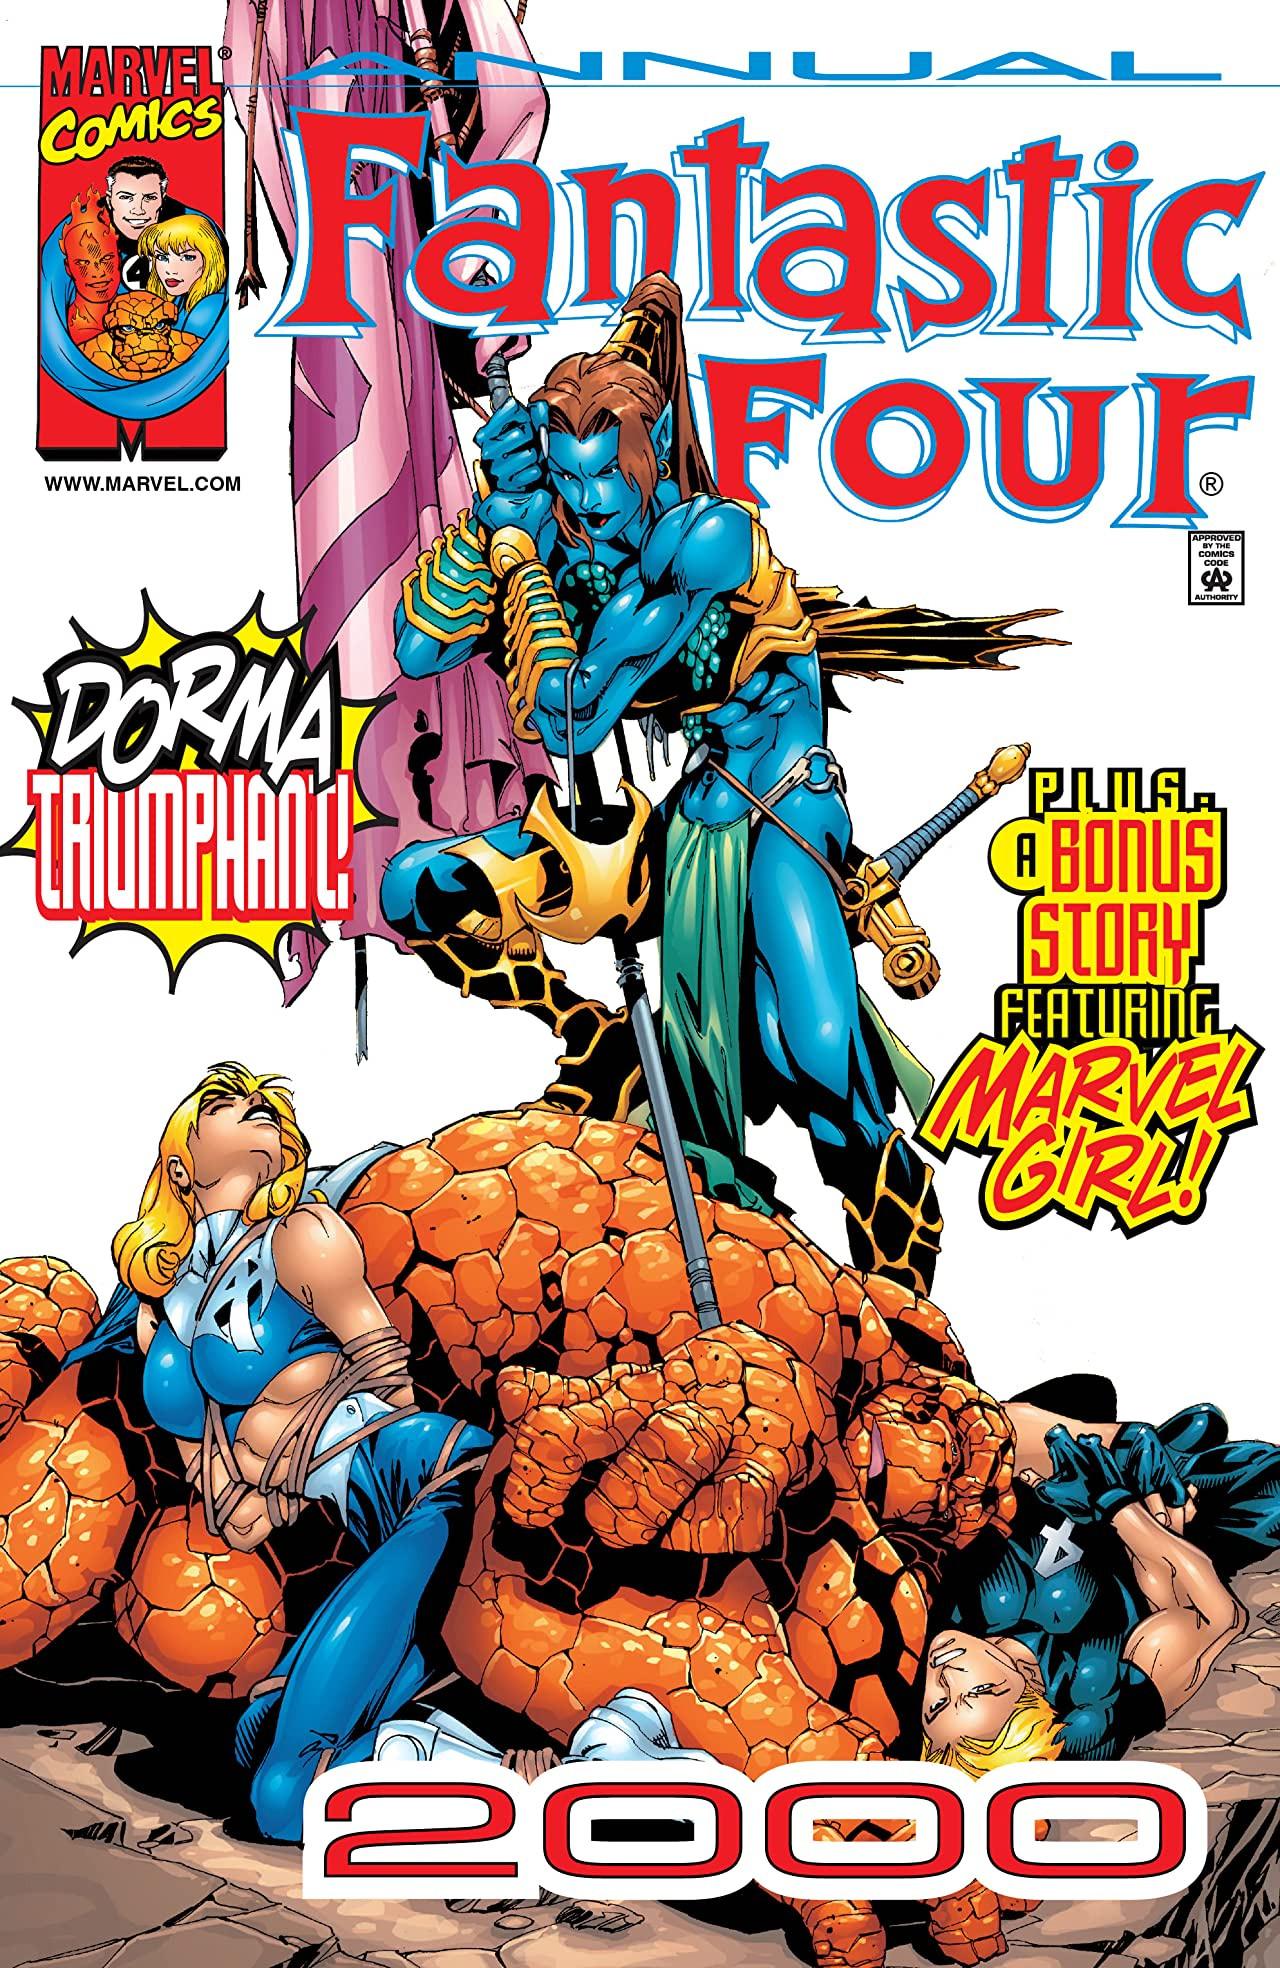 marvel comics 2000